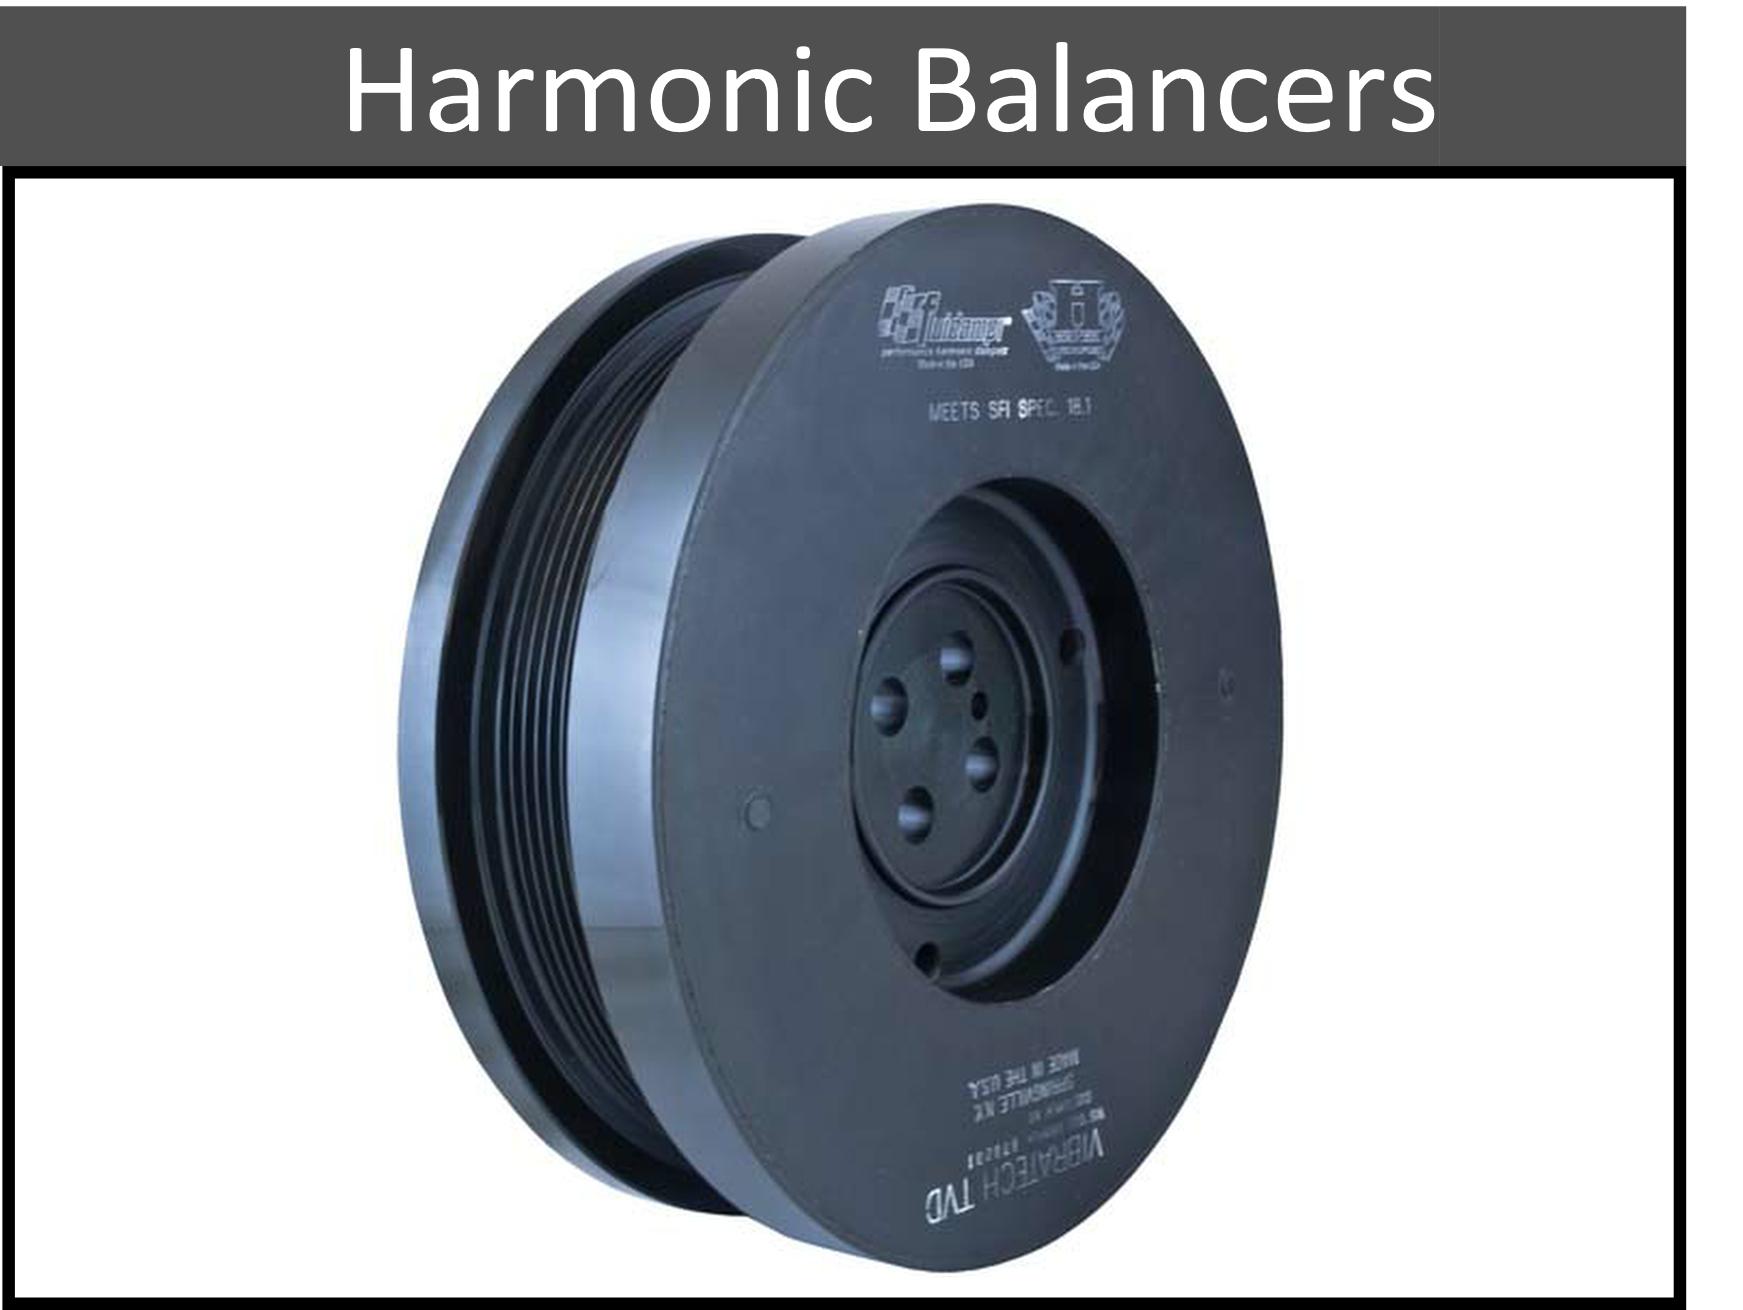 Harmonic Balancers